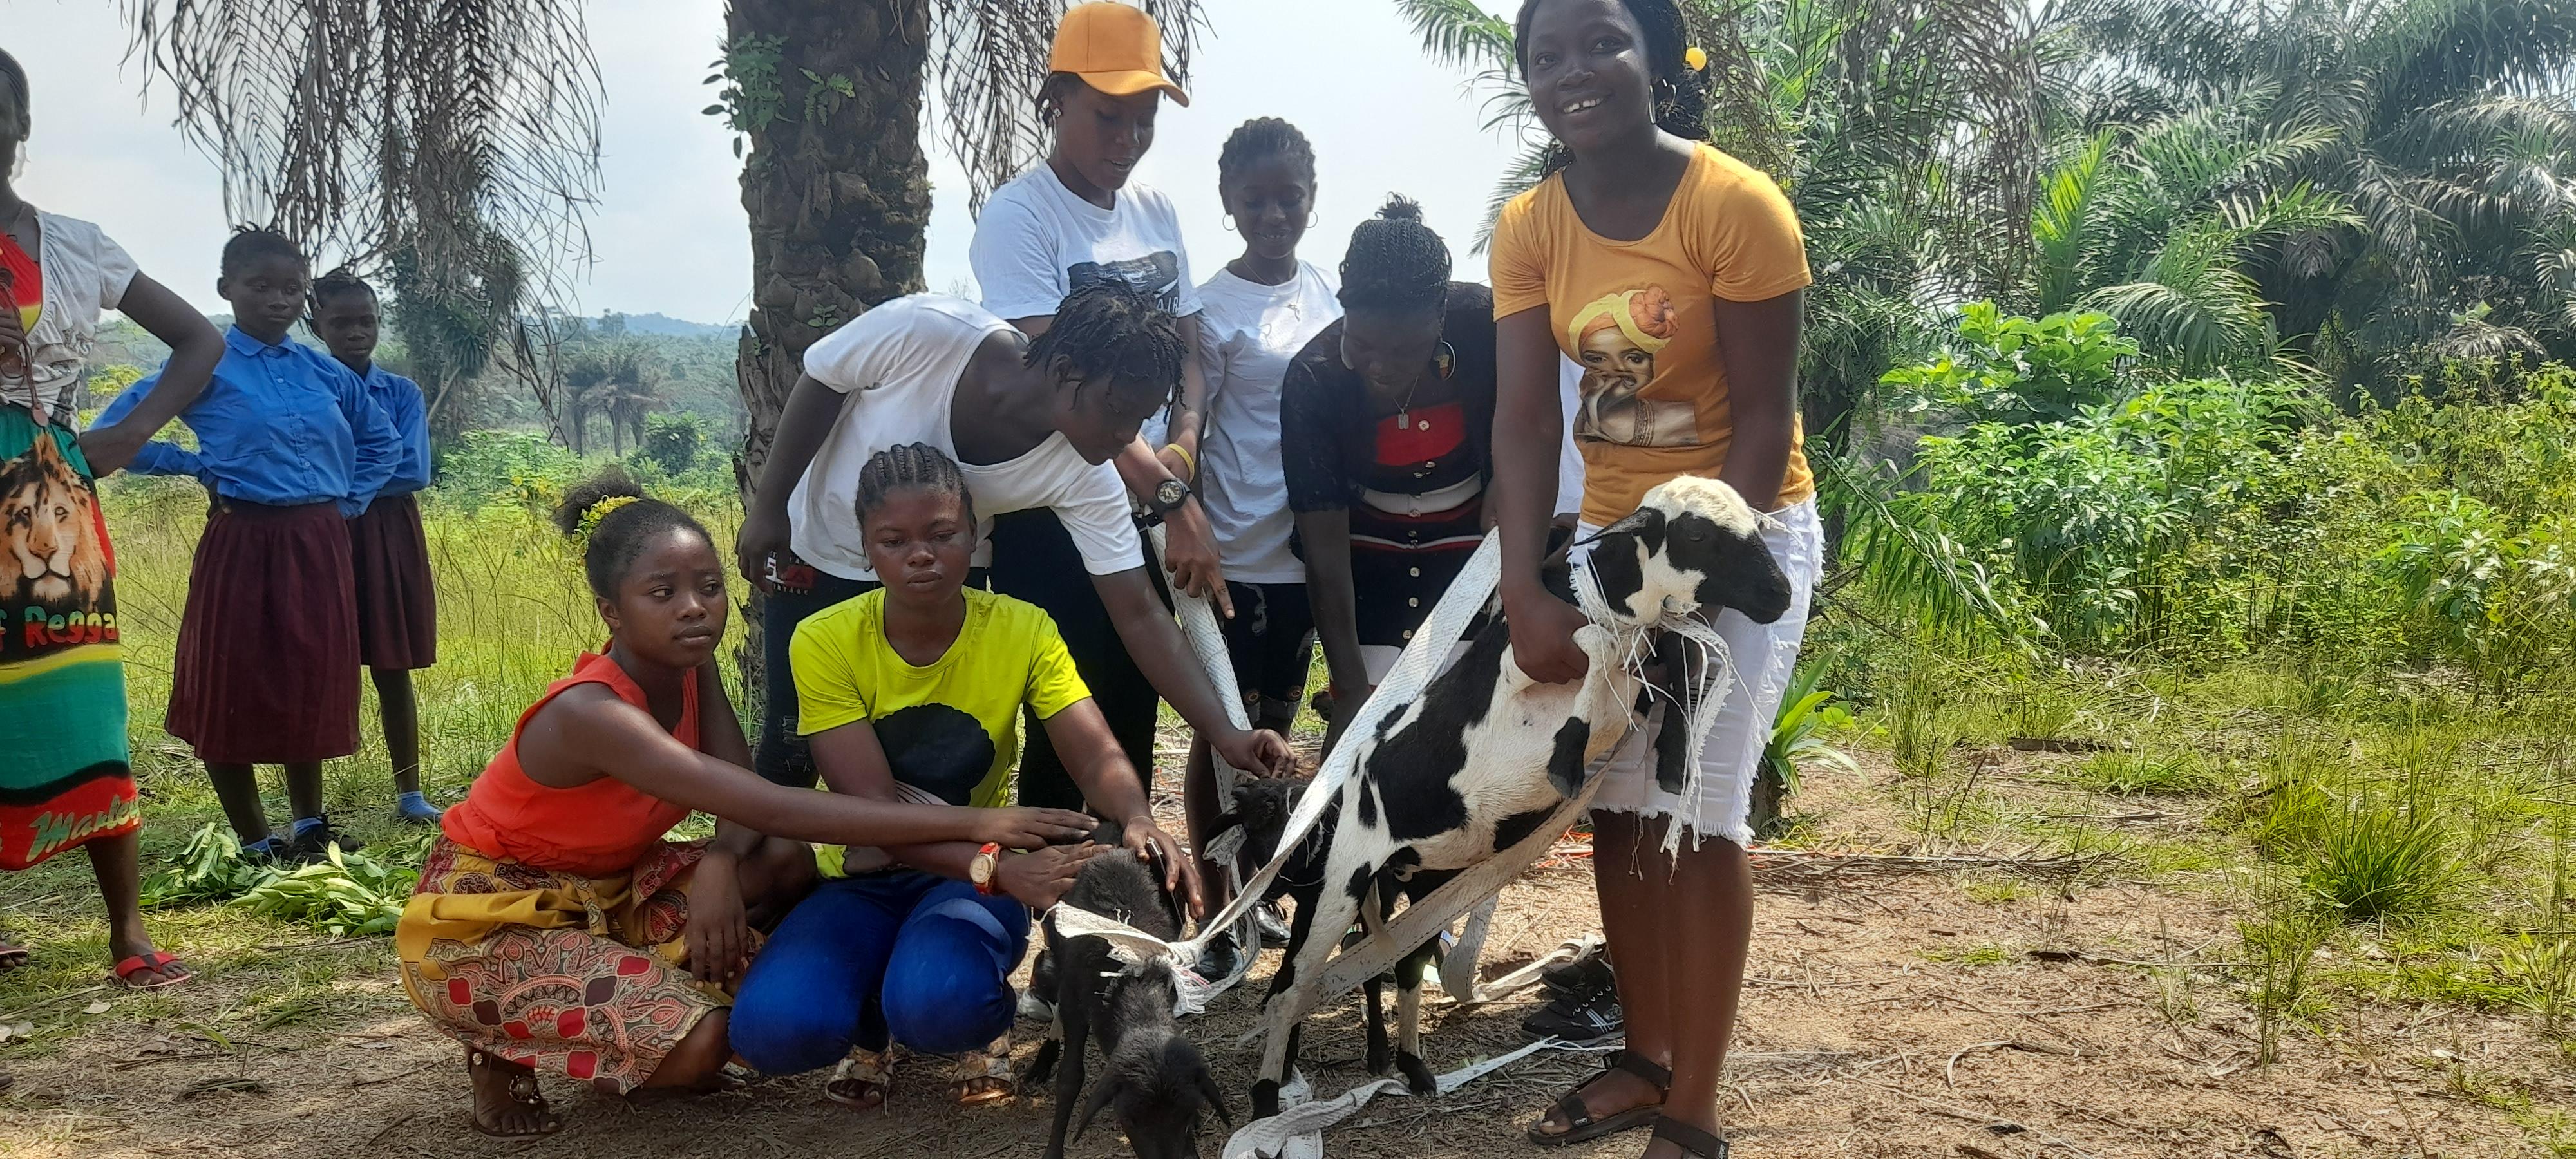 Girls learn how to help raise sheep.